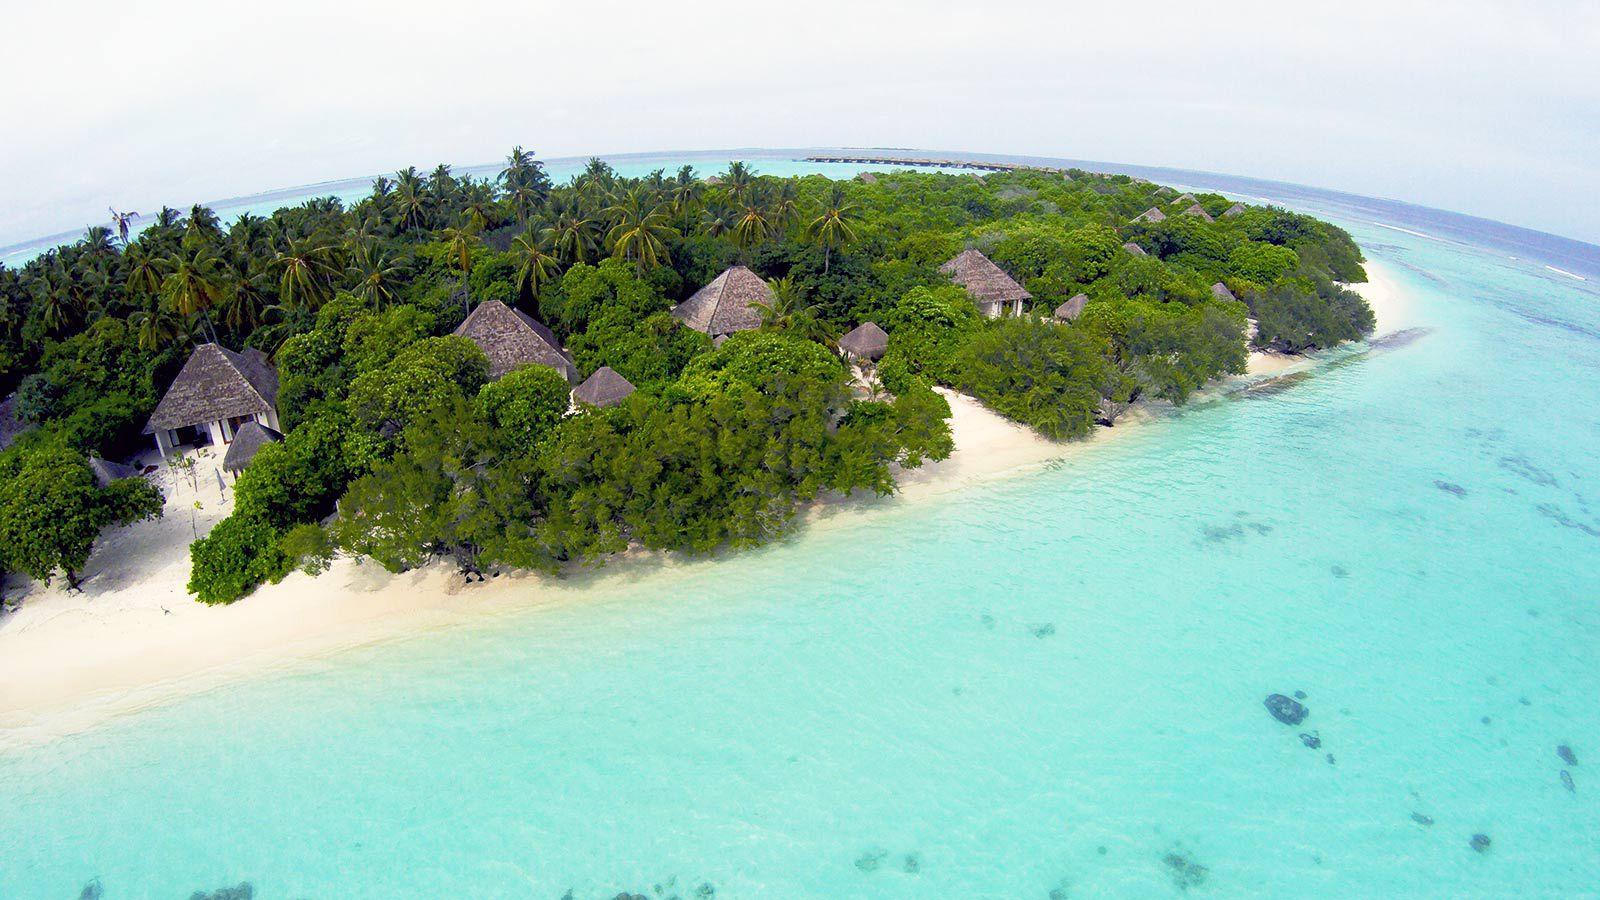 Hideaway-Maldives-villas-1-sunset-beach-villa-5